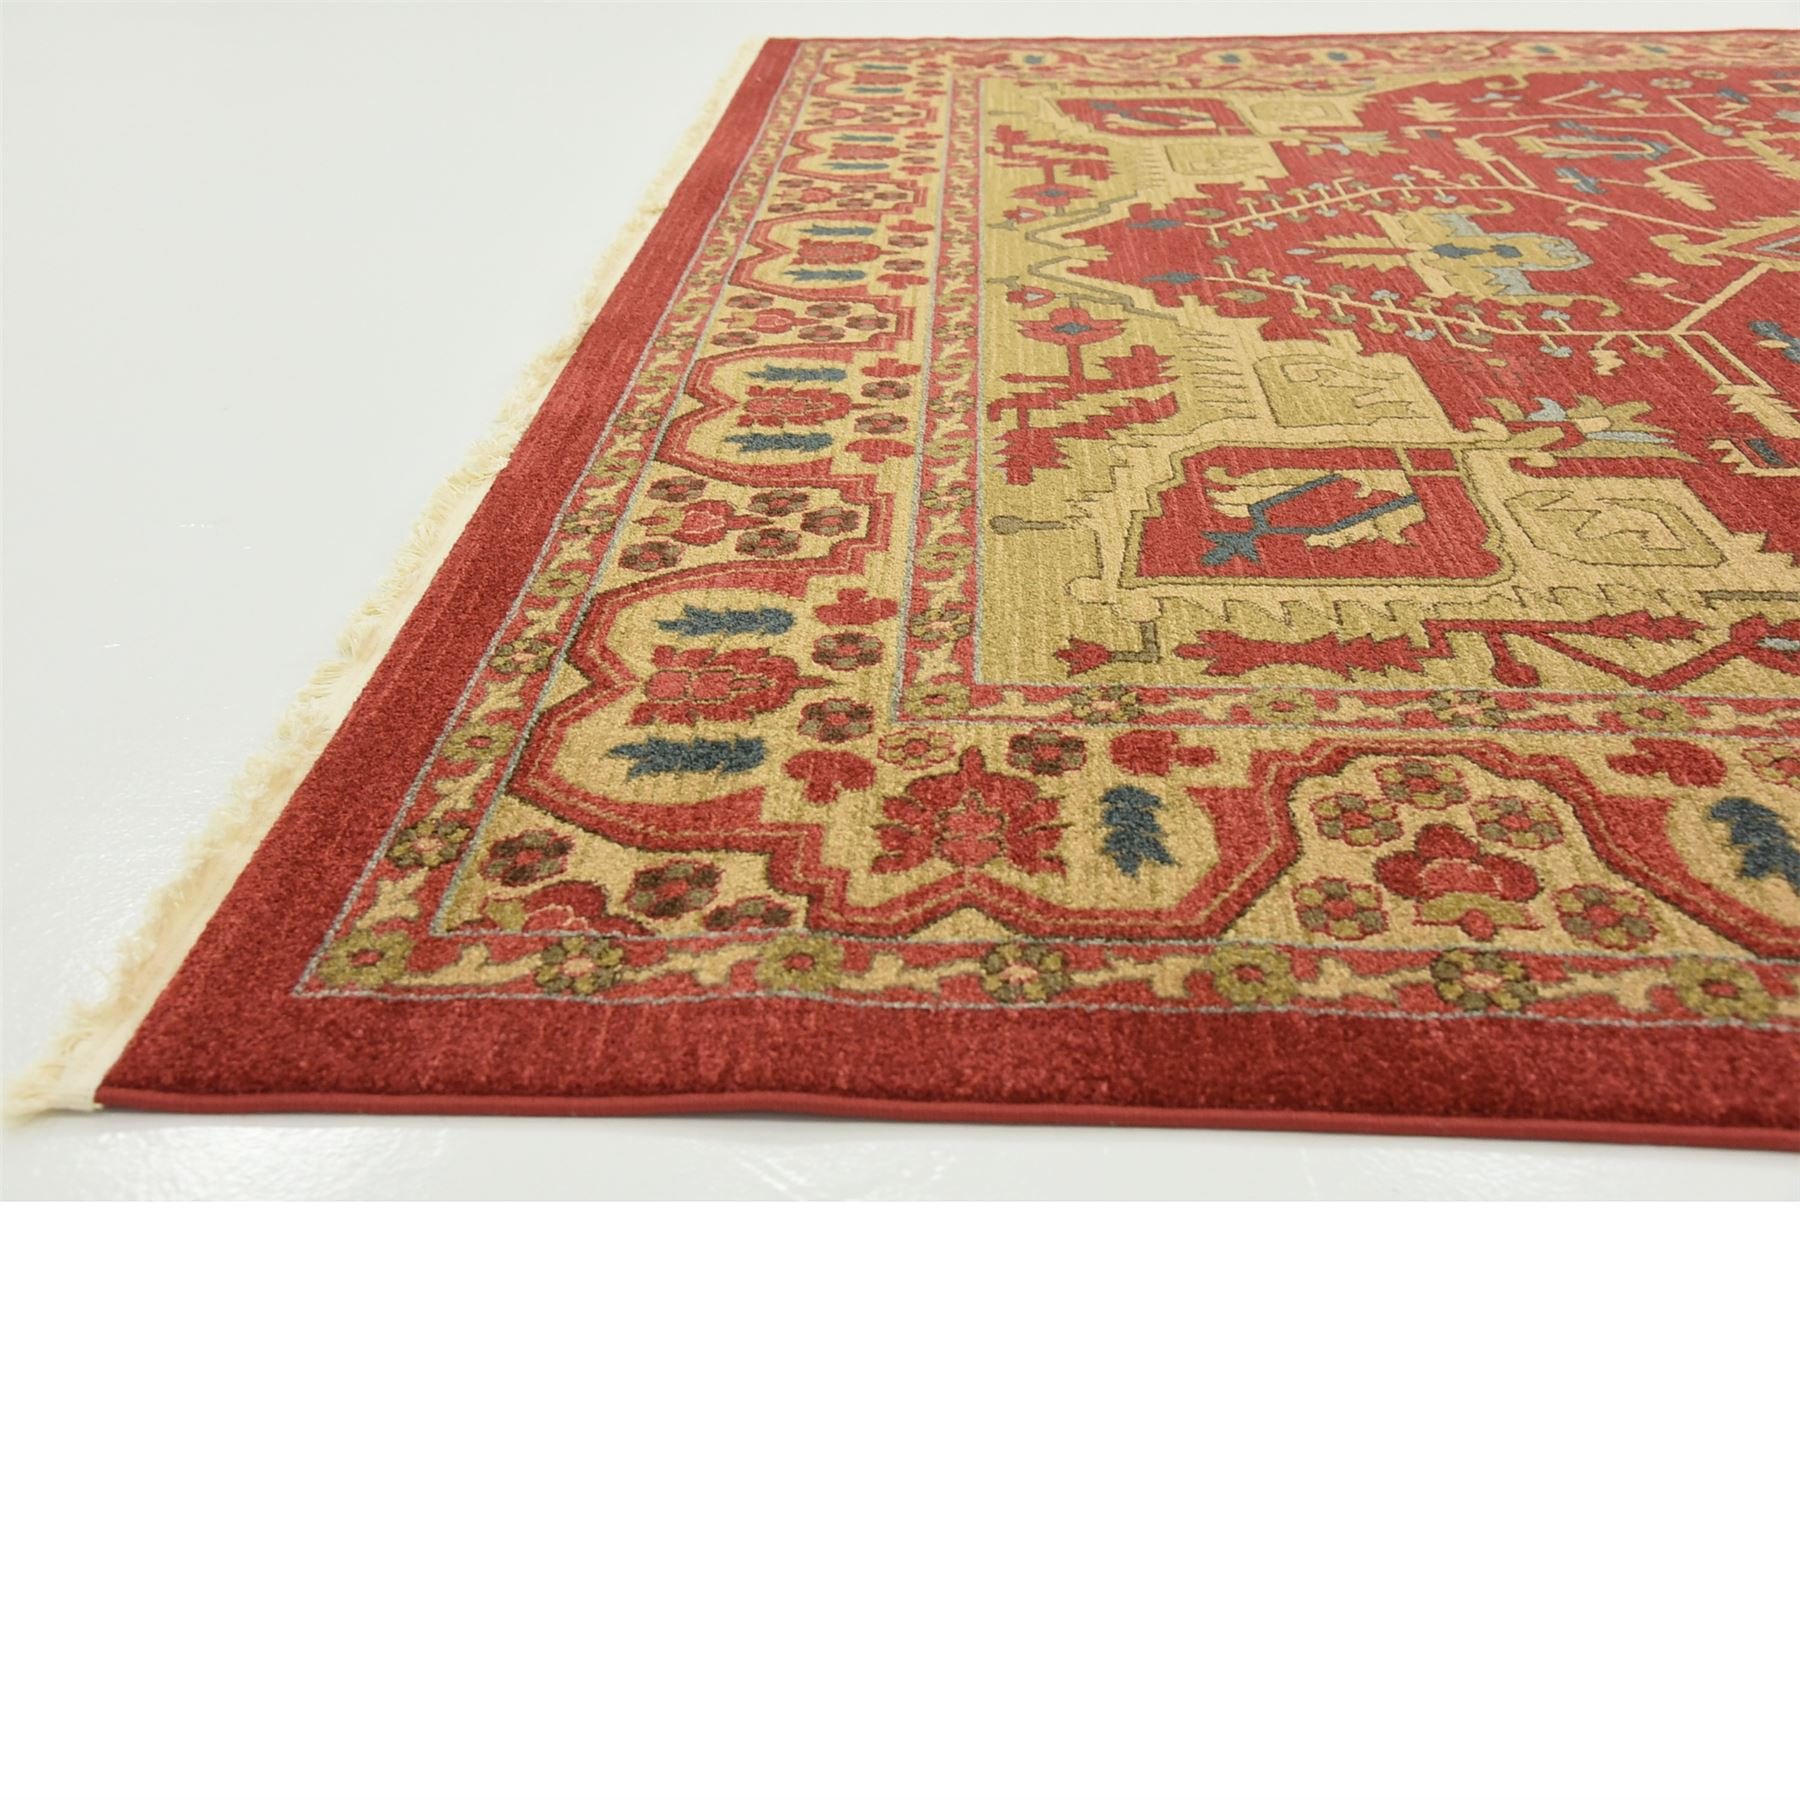 Persain Rug: Oriental Carpet Persian Geometric Traditional Rugs Red 9